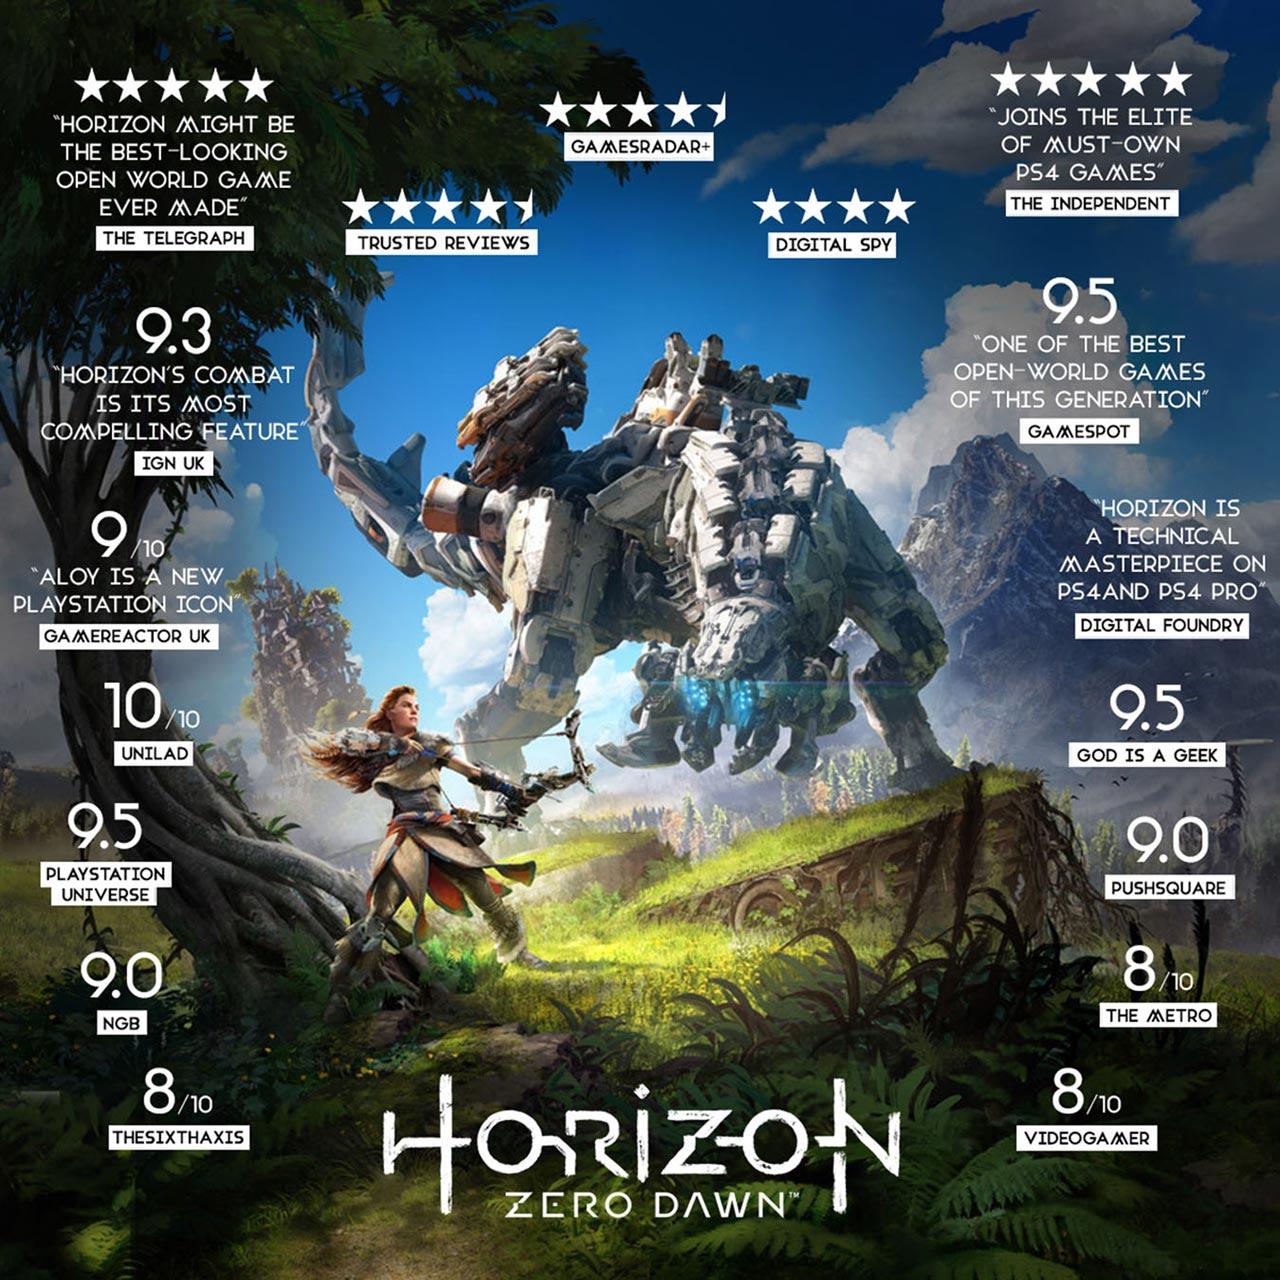 Sony Playstation P4reposny82446 Horizon Zero Dawn For Ps4 01 03 2017 4 Reg 3 49